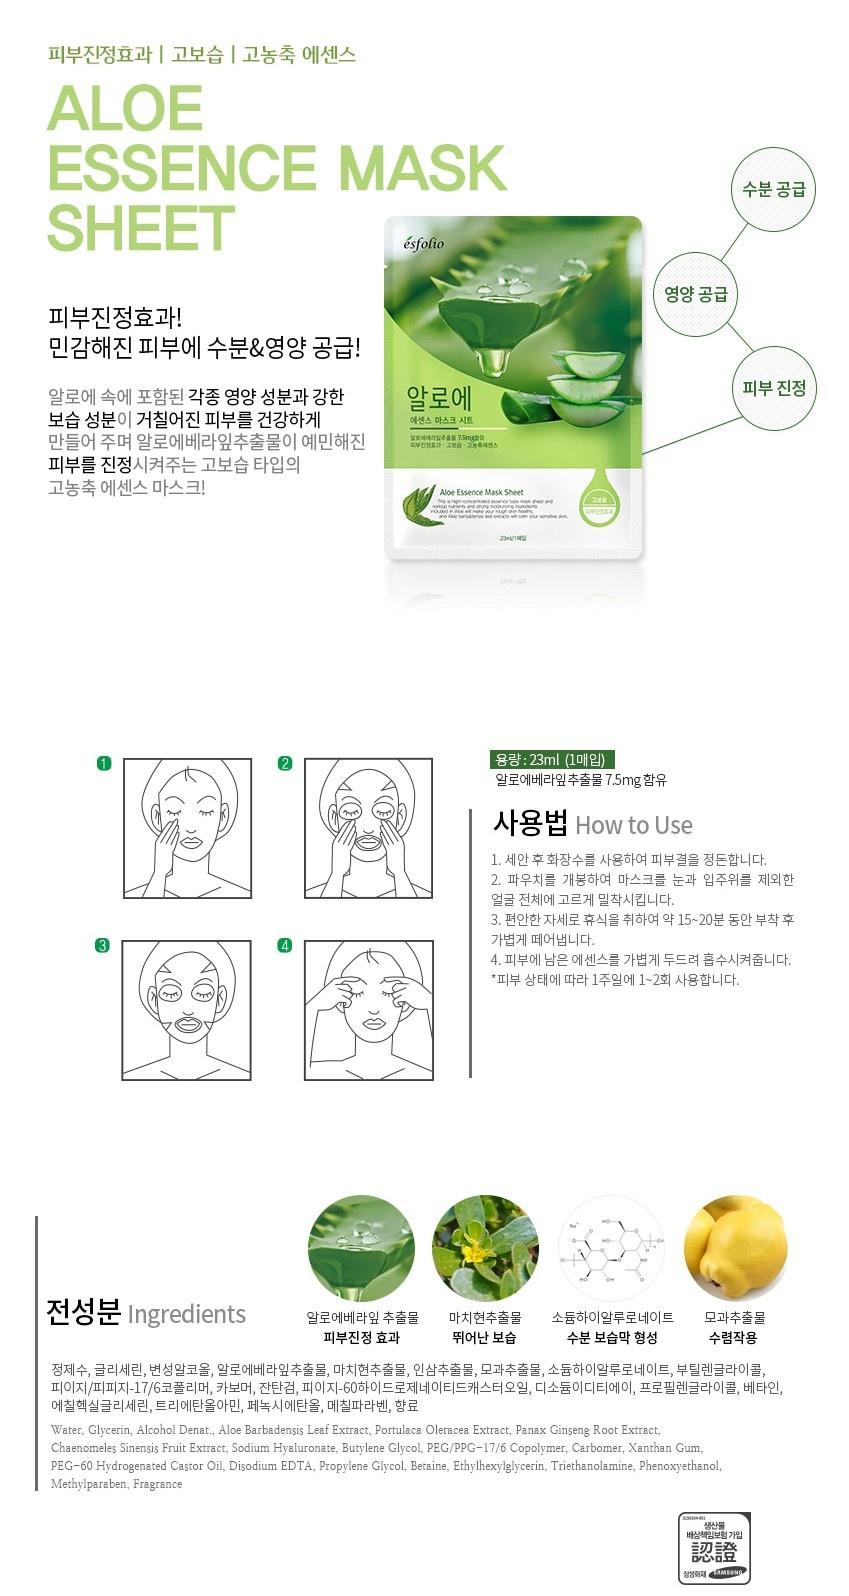 Aloe Essence Mask Sheet-3